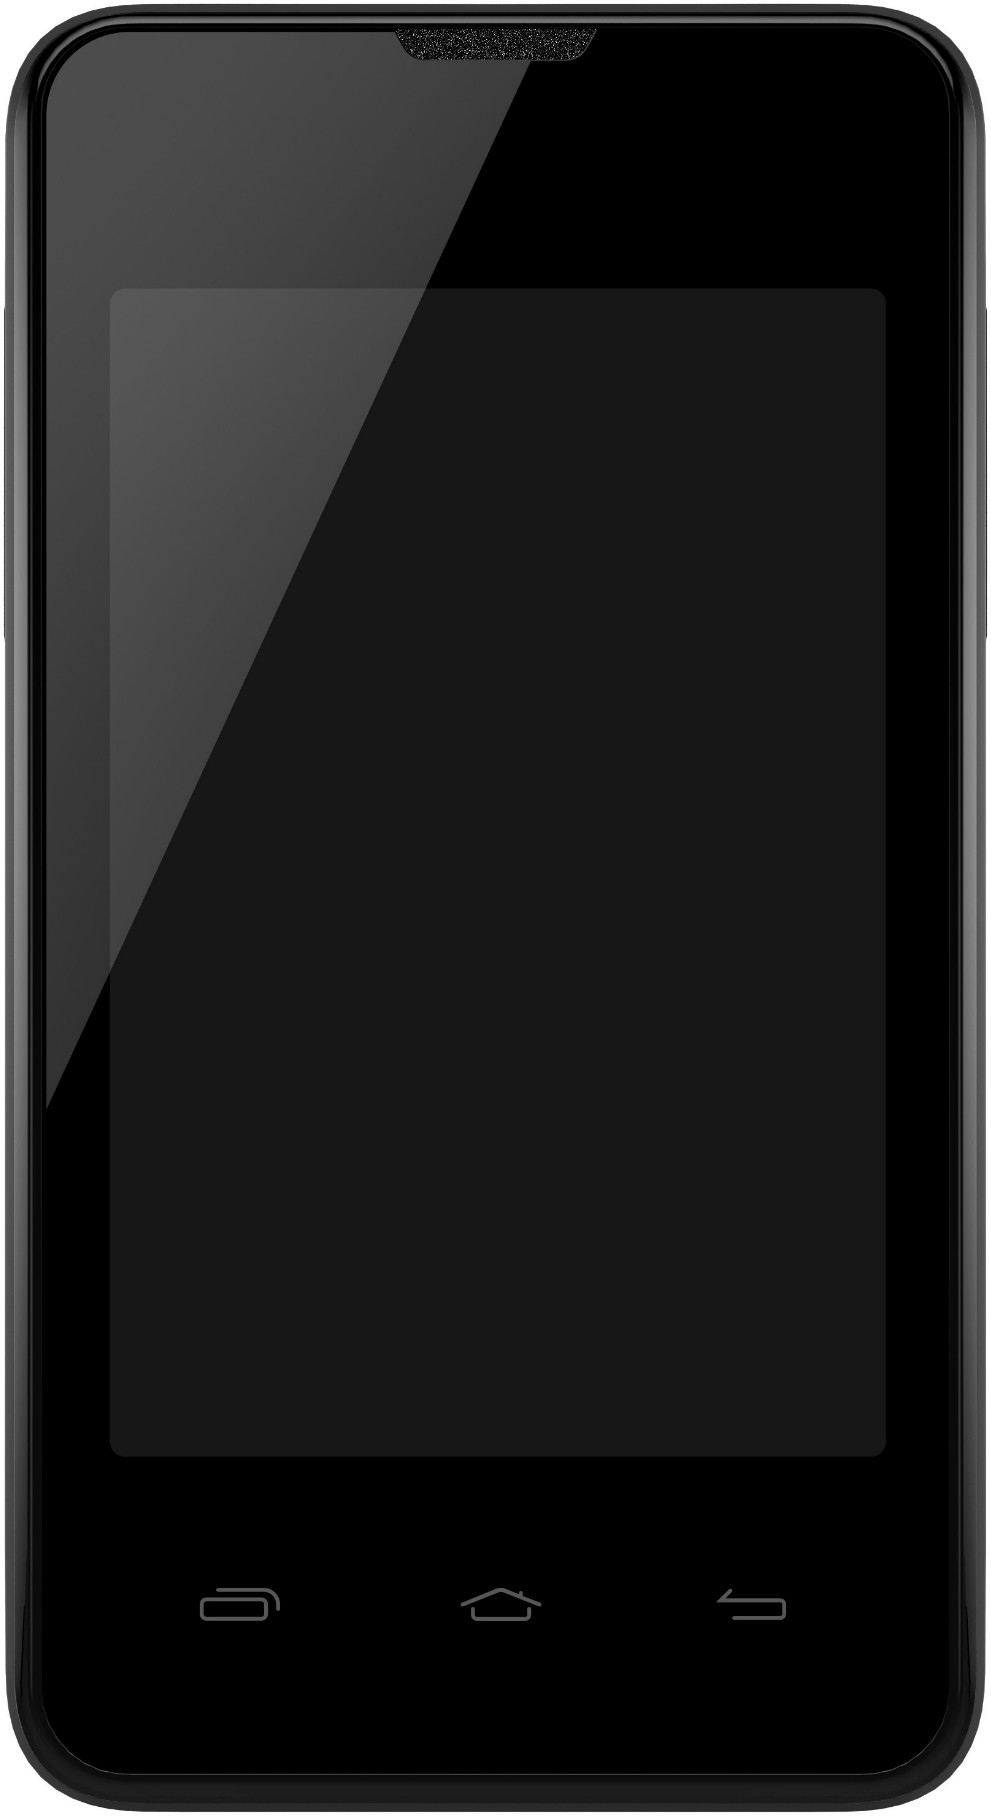 Micromax Bolt A58 (Black, 512 MB)(512 MB RAM)